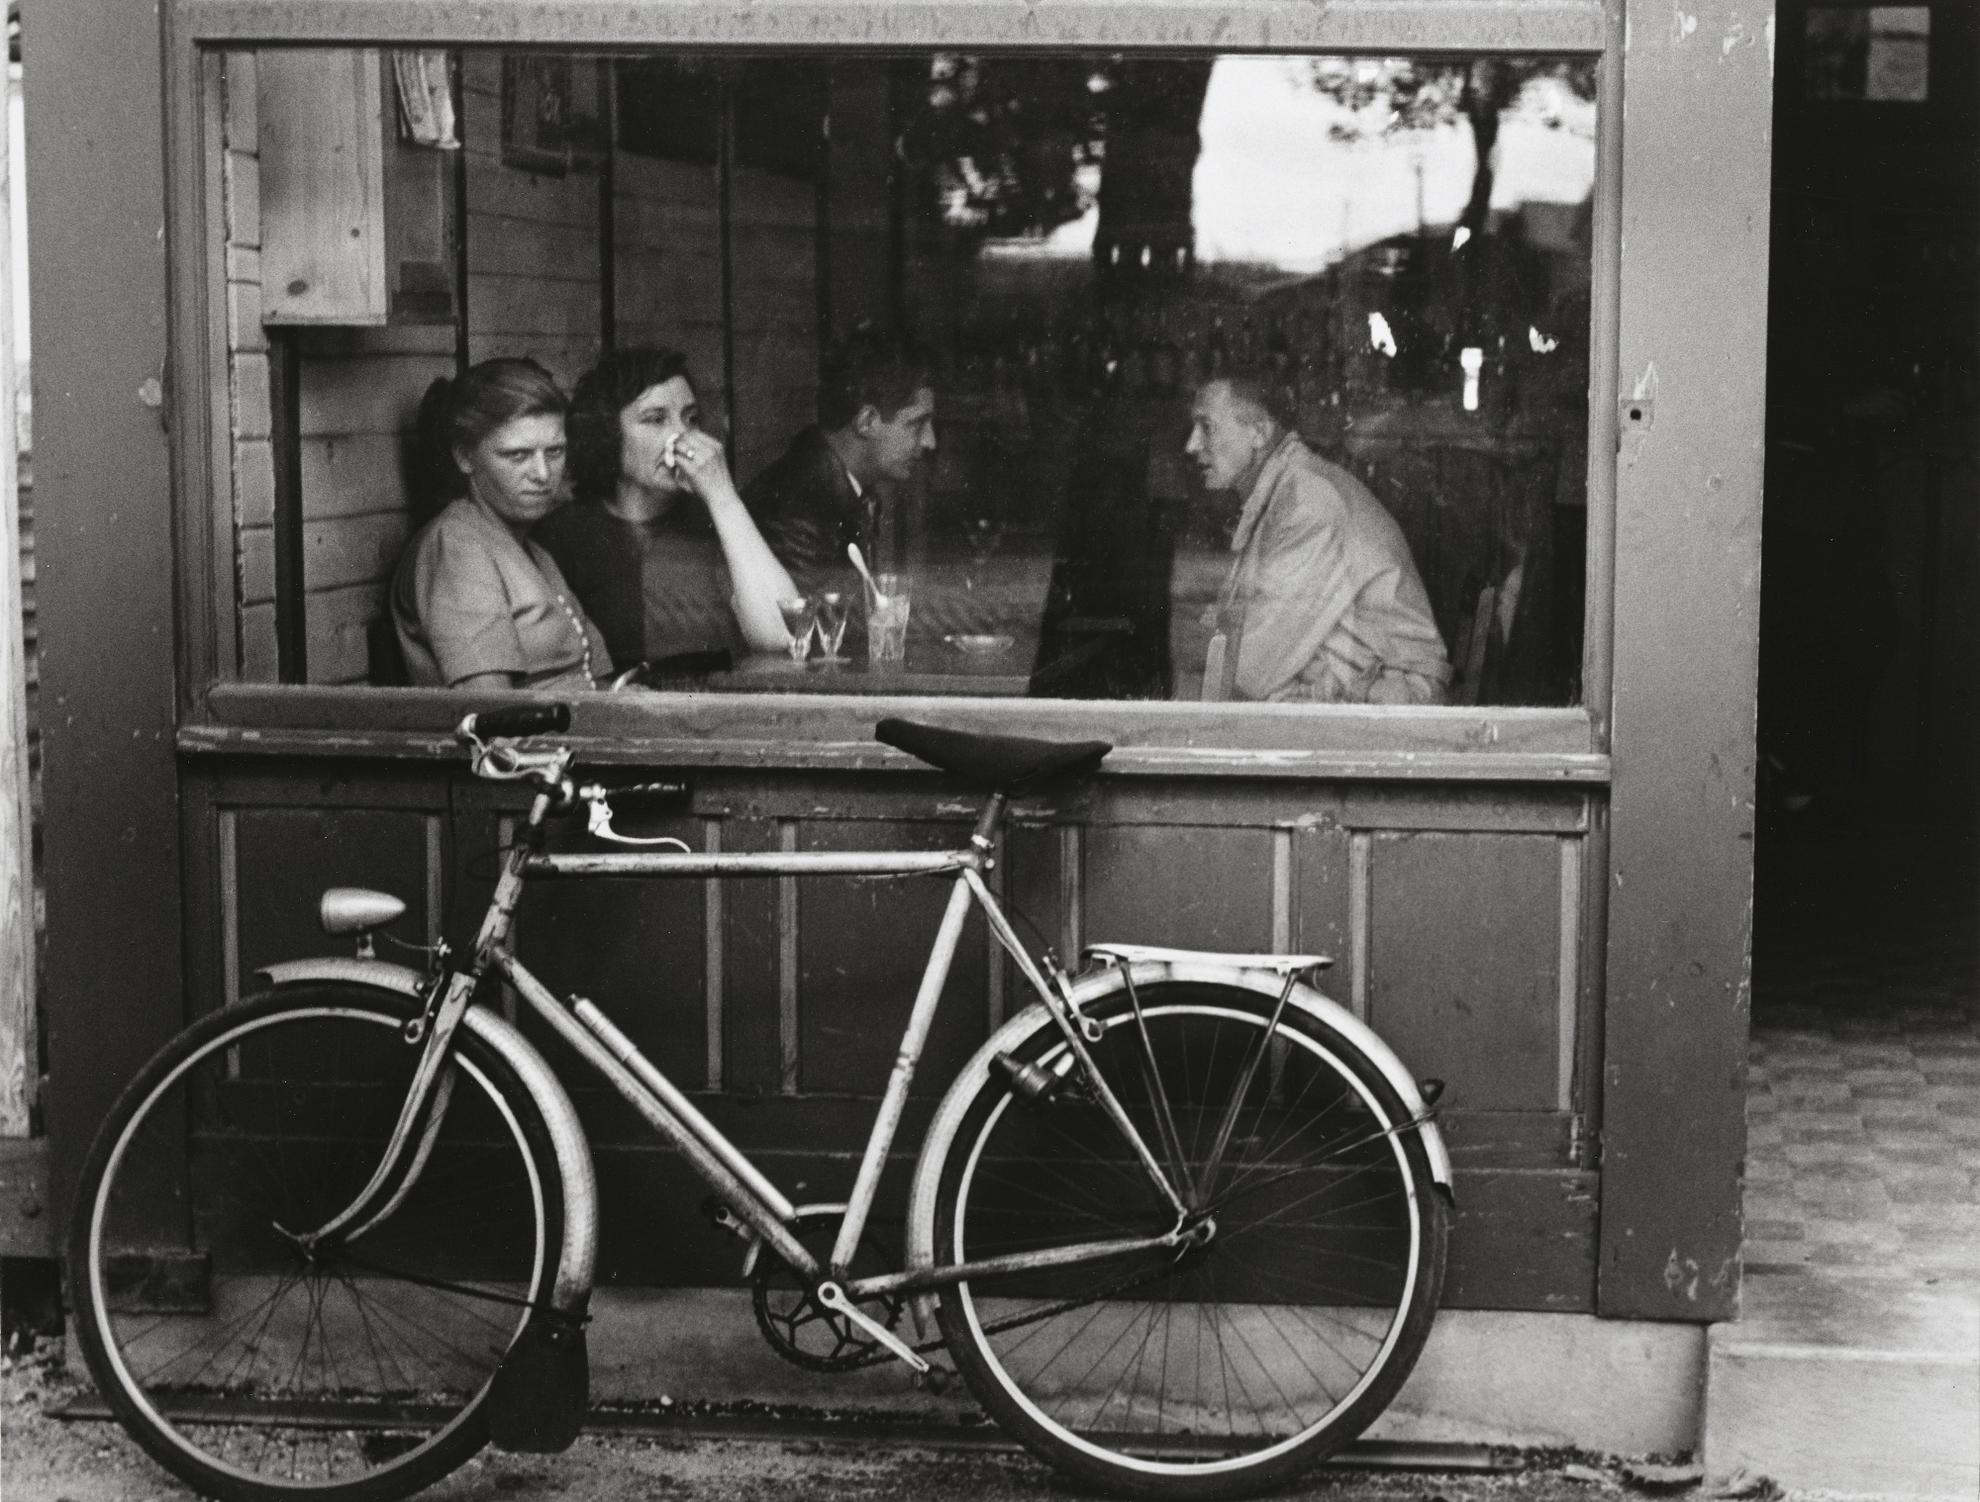 Andre Kertesz-Bistro, Paris-1930